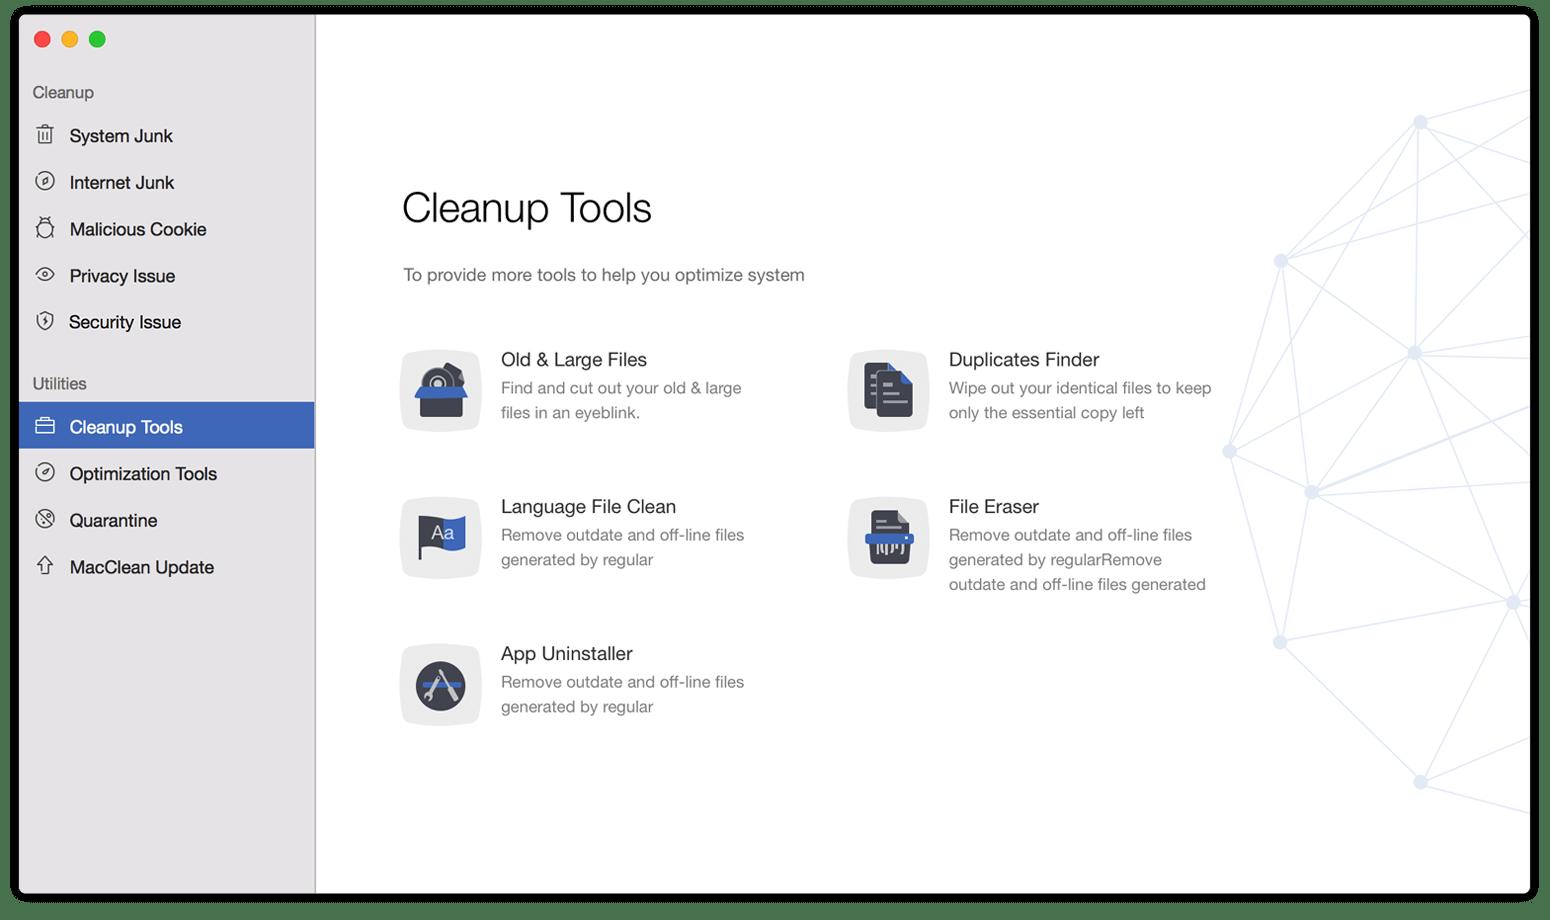 MacClean Pro 3.6.0.20200319  Mac 破解版 - 清理、优化、隐私和安全防护